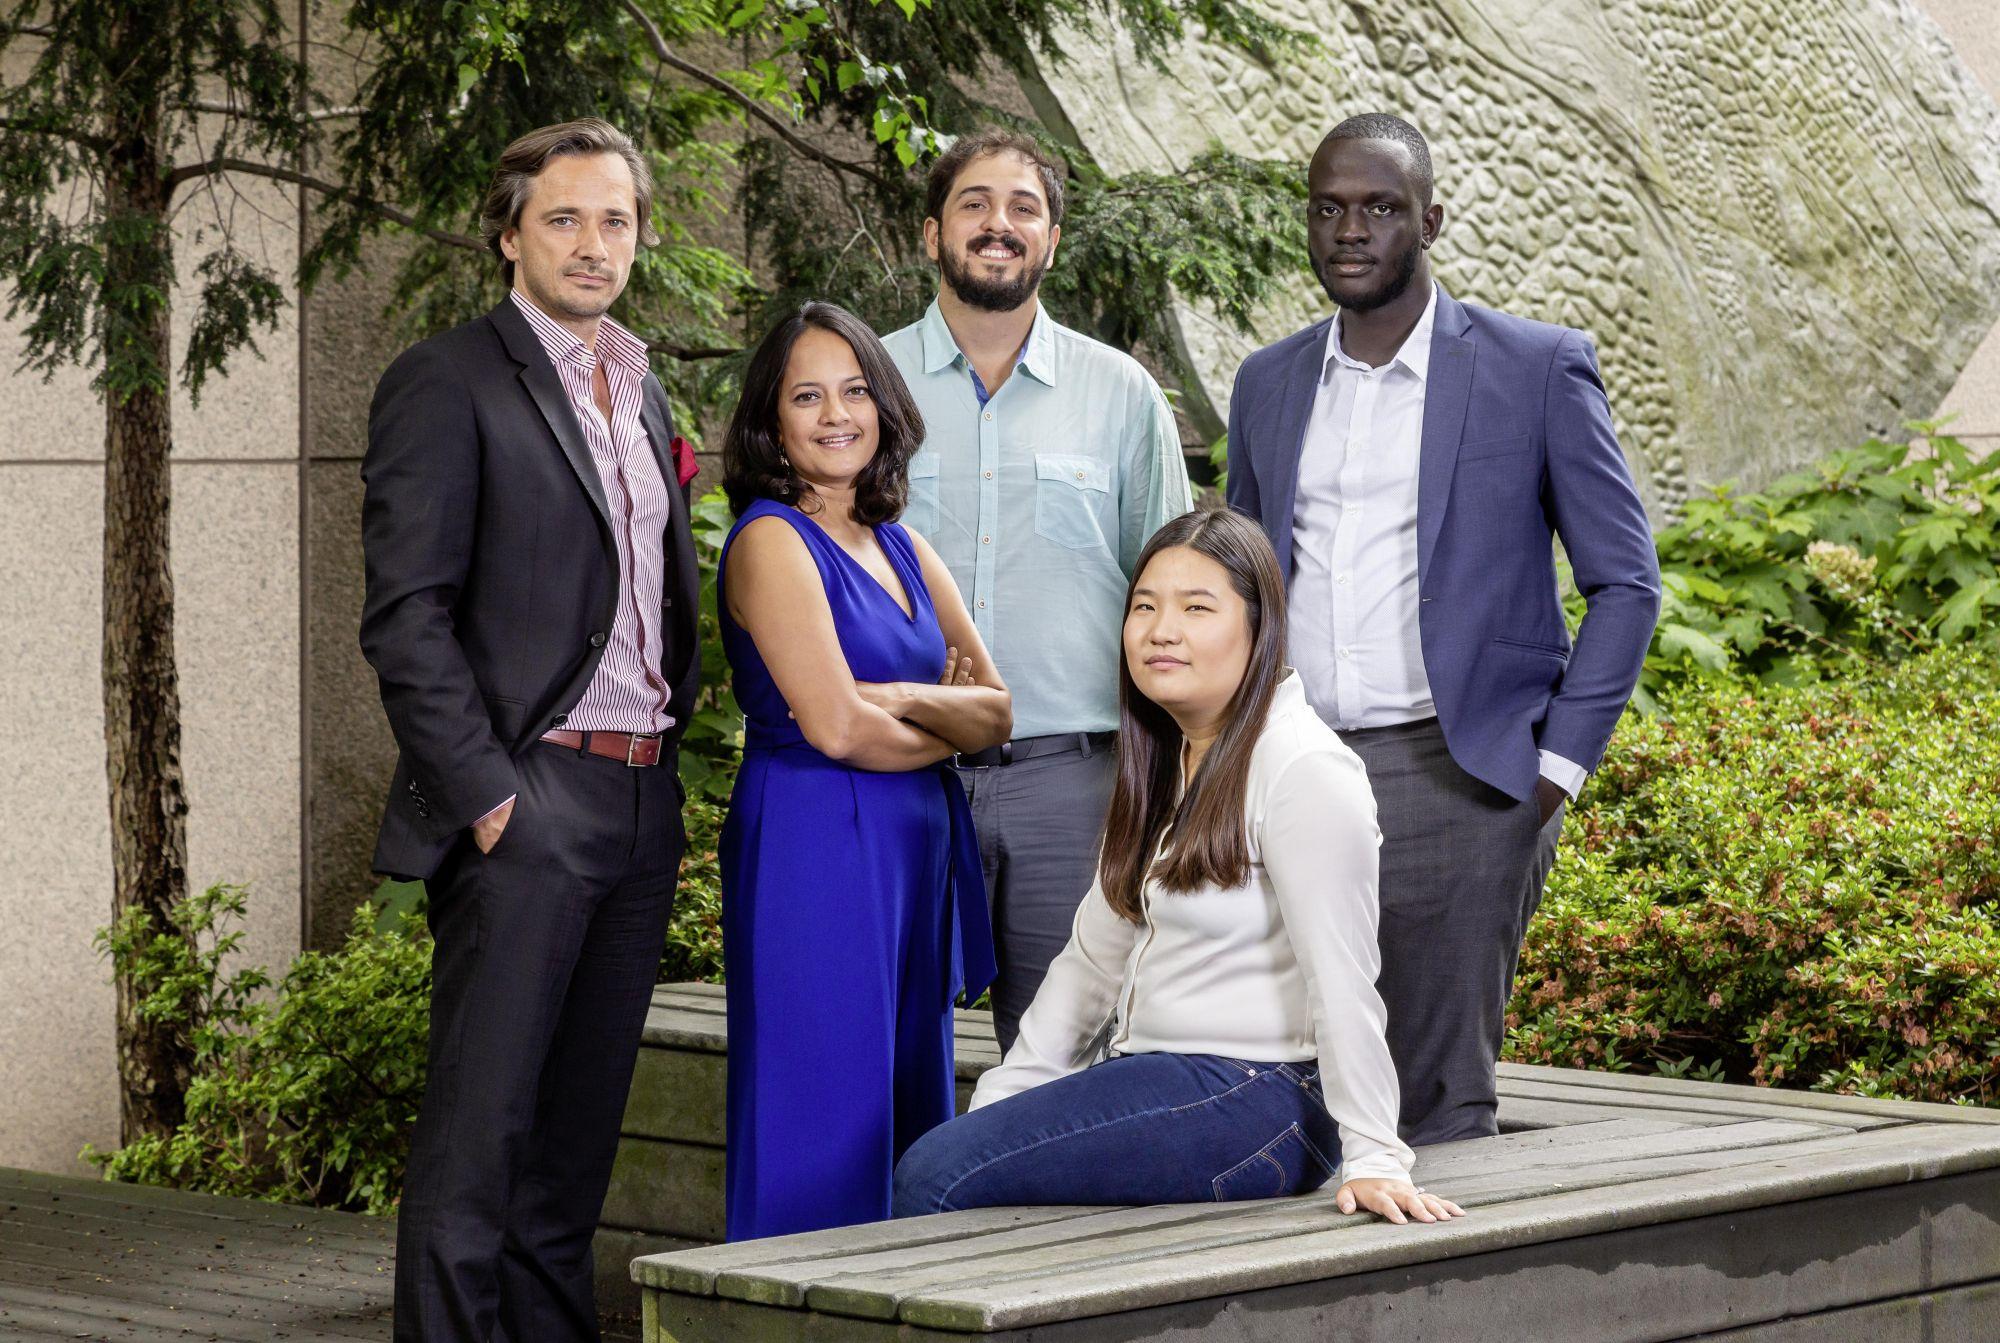 Laureates Rolex Awards for enterprise 2019. From left: Grégoire Courtine, Krithi Karanth, João Campos-Silva, Miranda Wang, Brian Gitta.